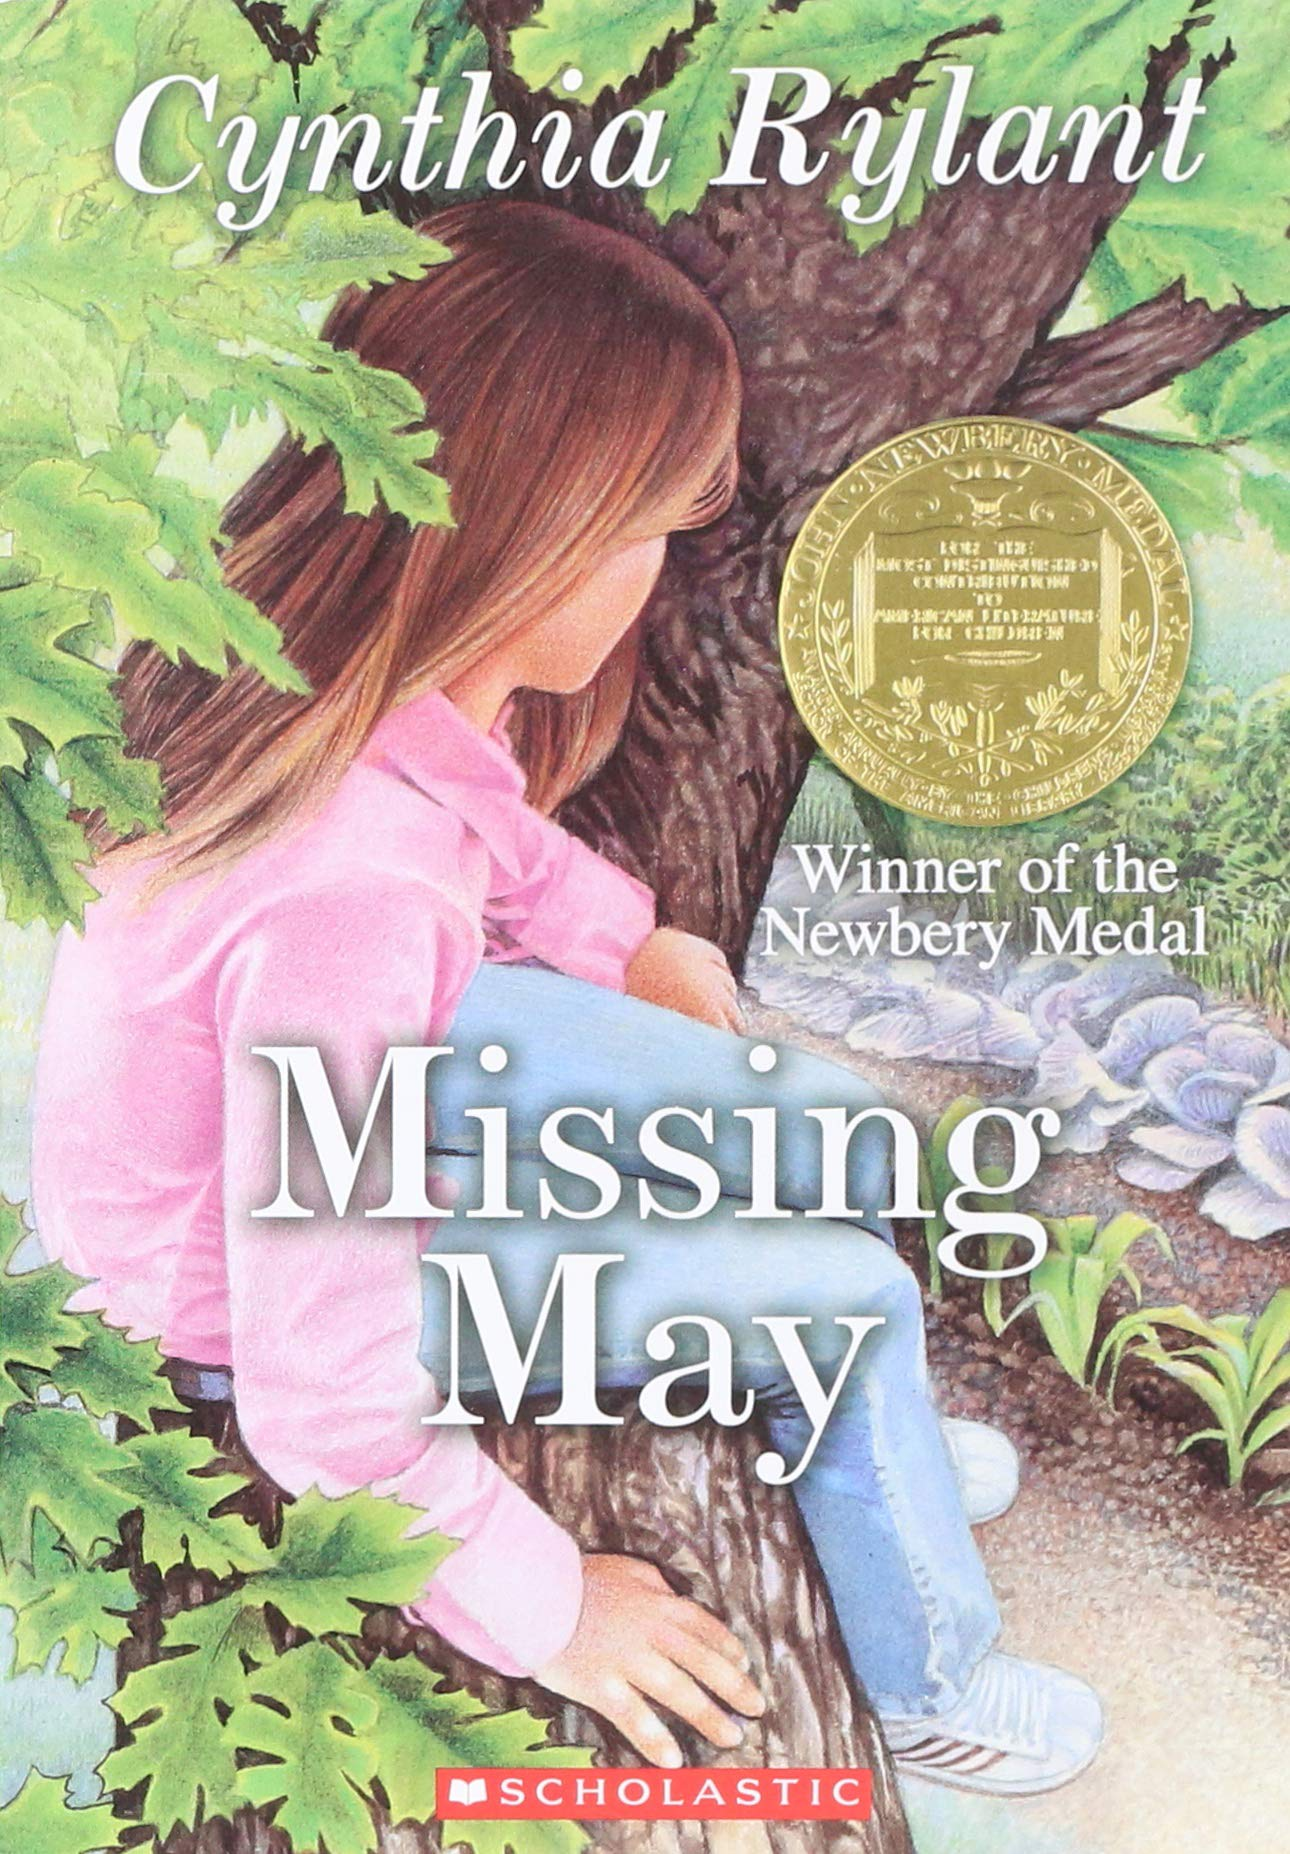 037ef2a57c8c4 Missing May (Scholastic Gold): Cynthia Rylant: 9780439613835: Amazon ...